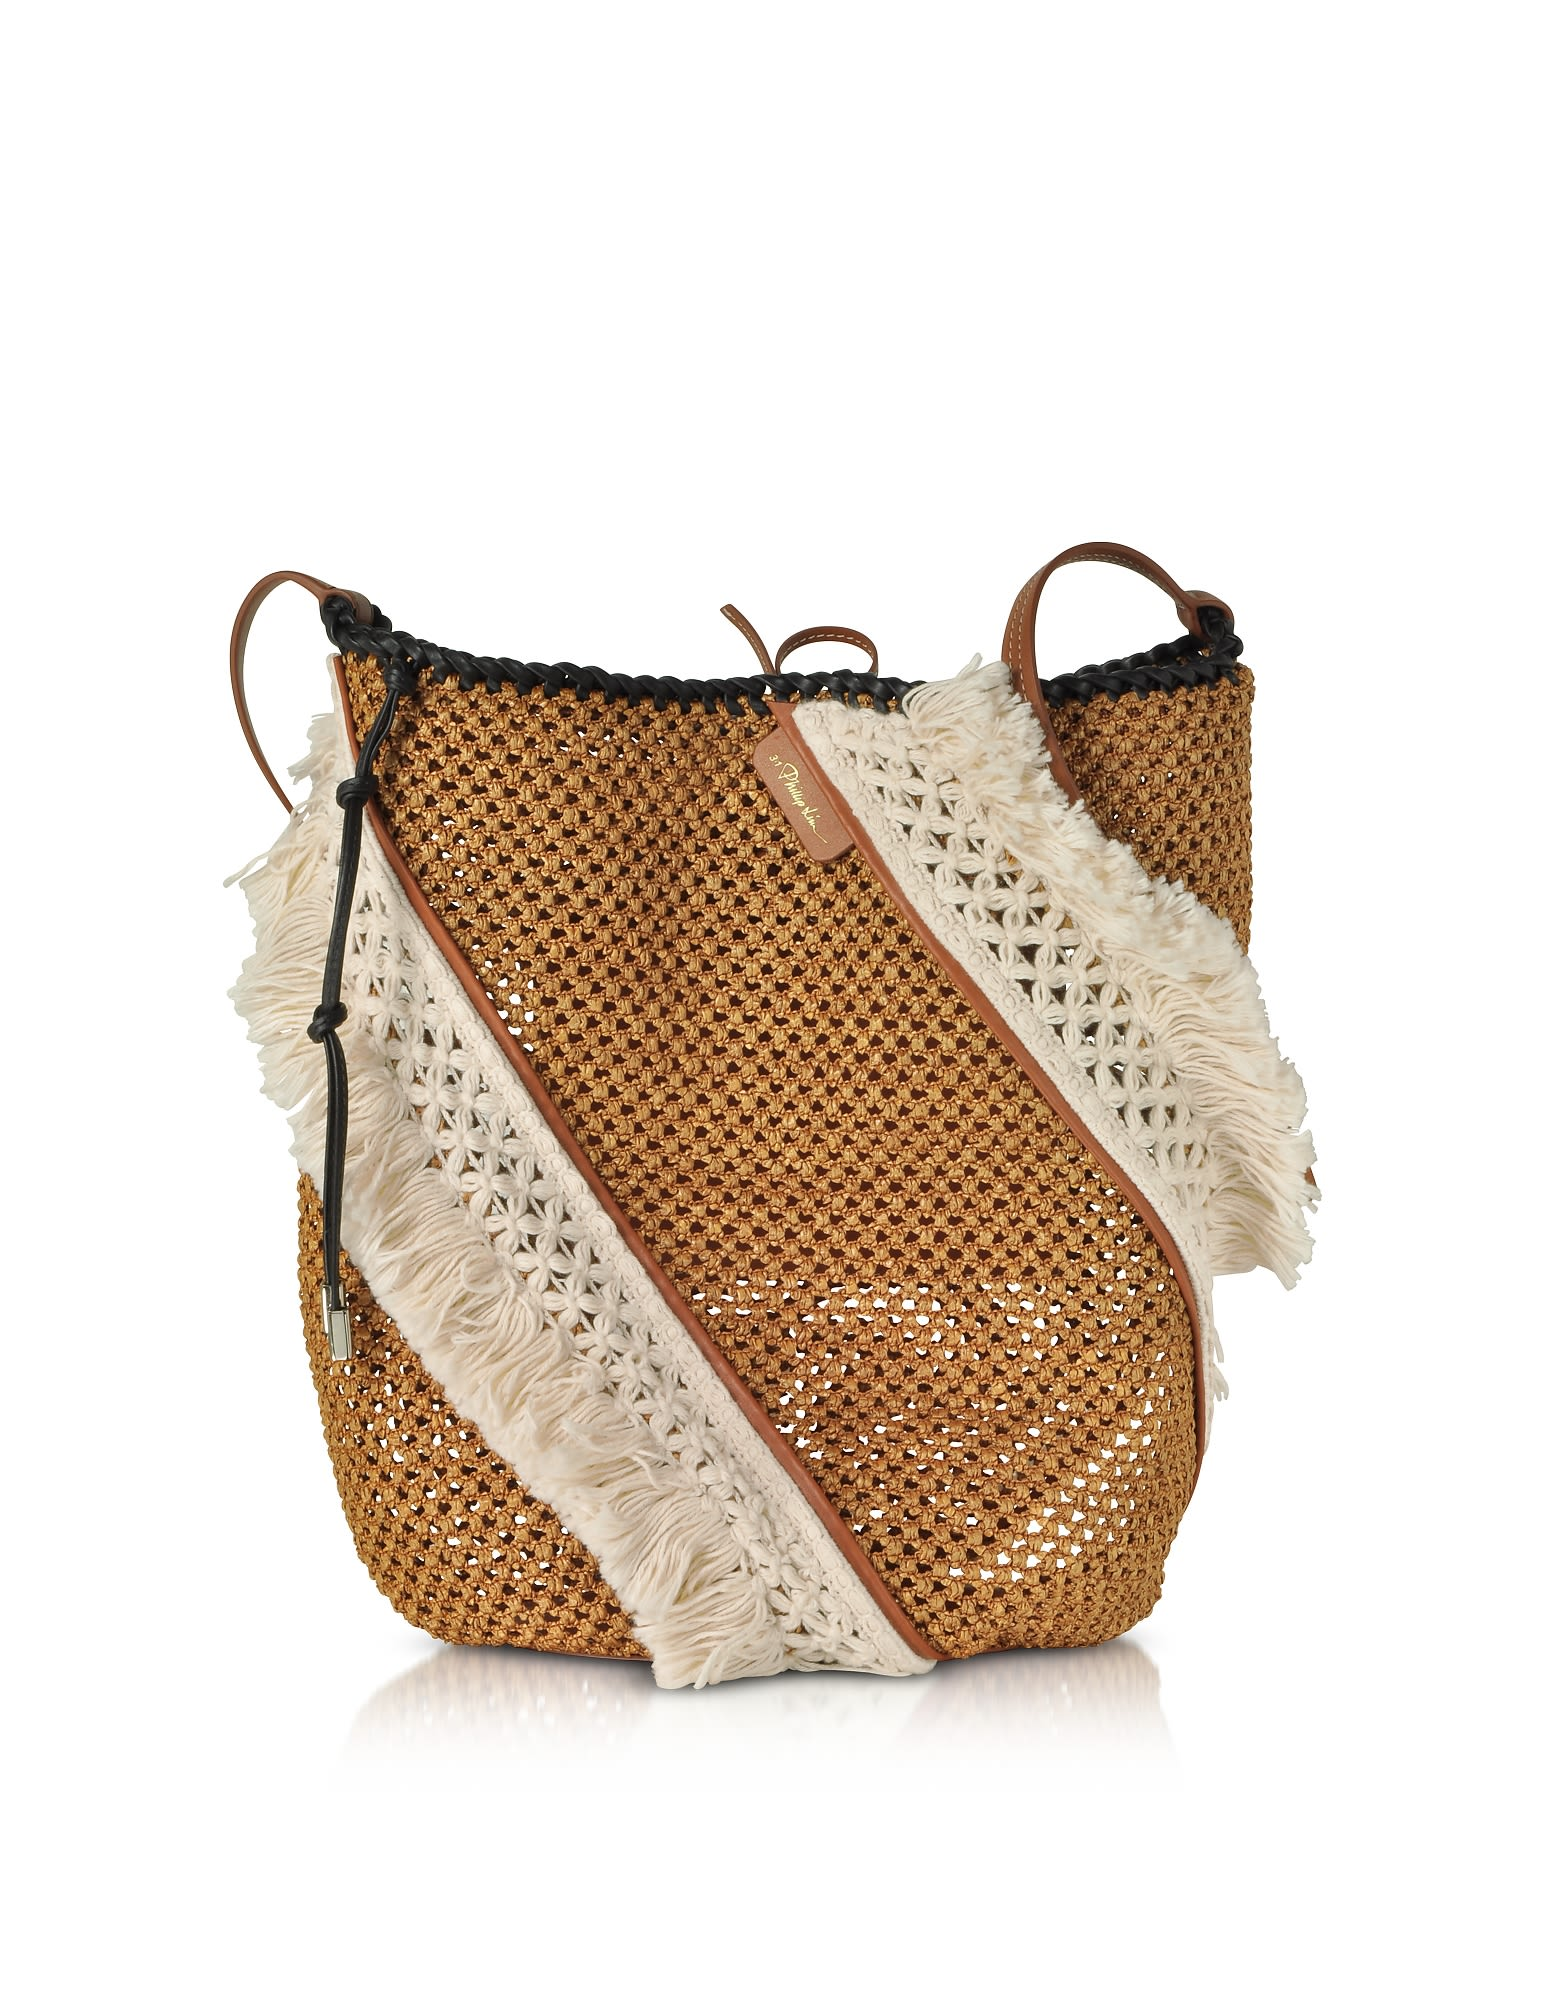 Marlee Open Weave Bag W/Fringes in Cognac